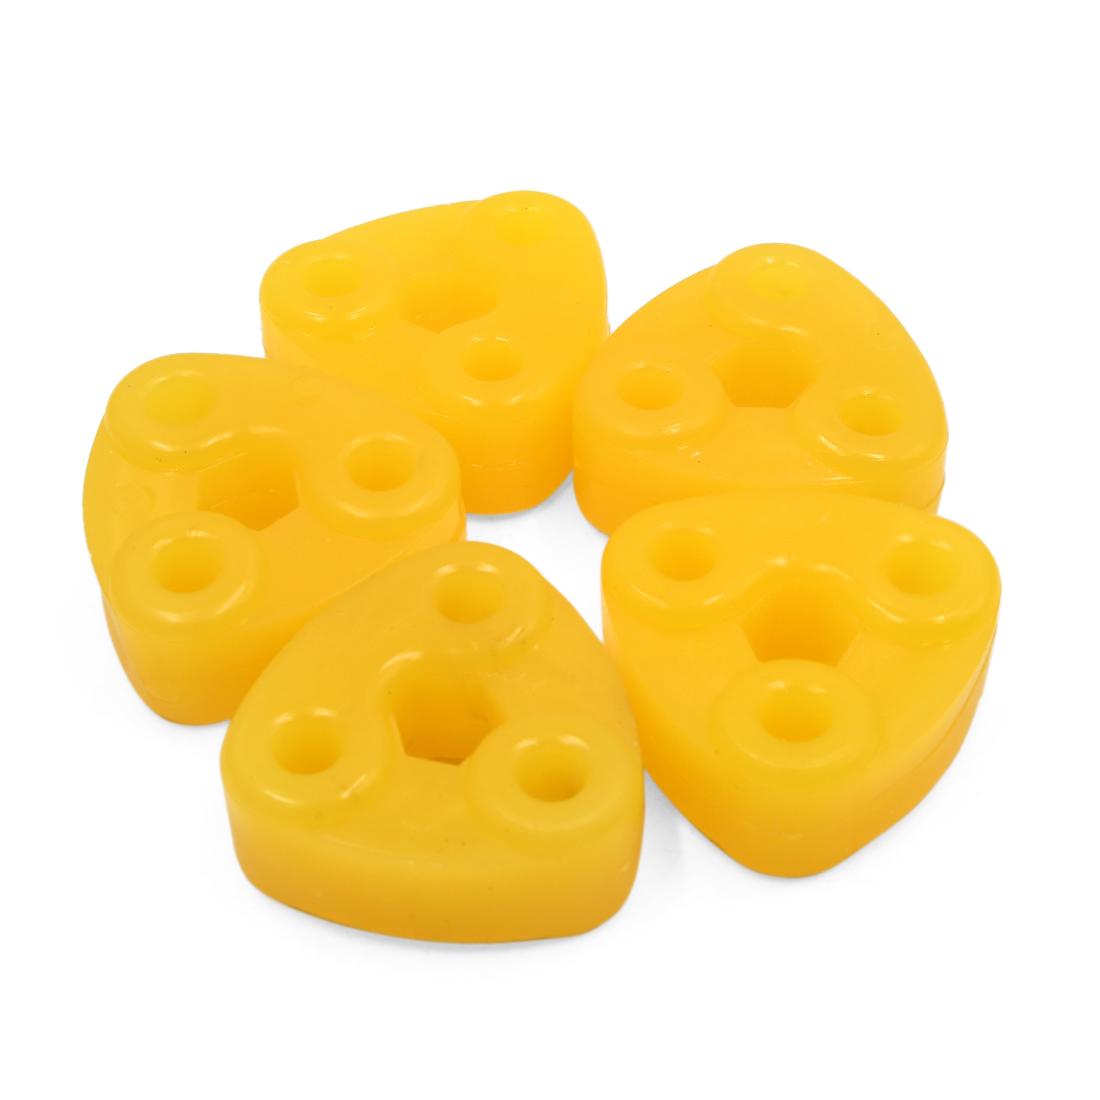 5Pcs Triangle Orange Rubber Shock Absorber Bushings Damper for Auto Car